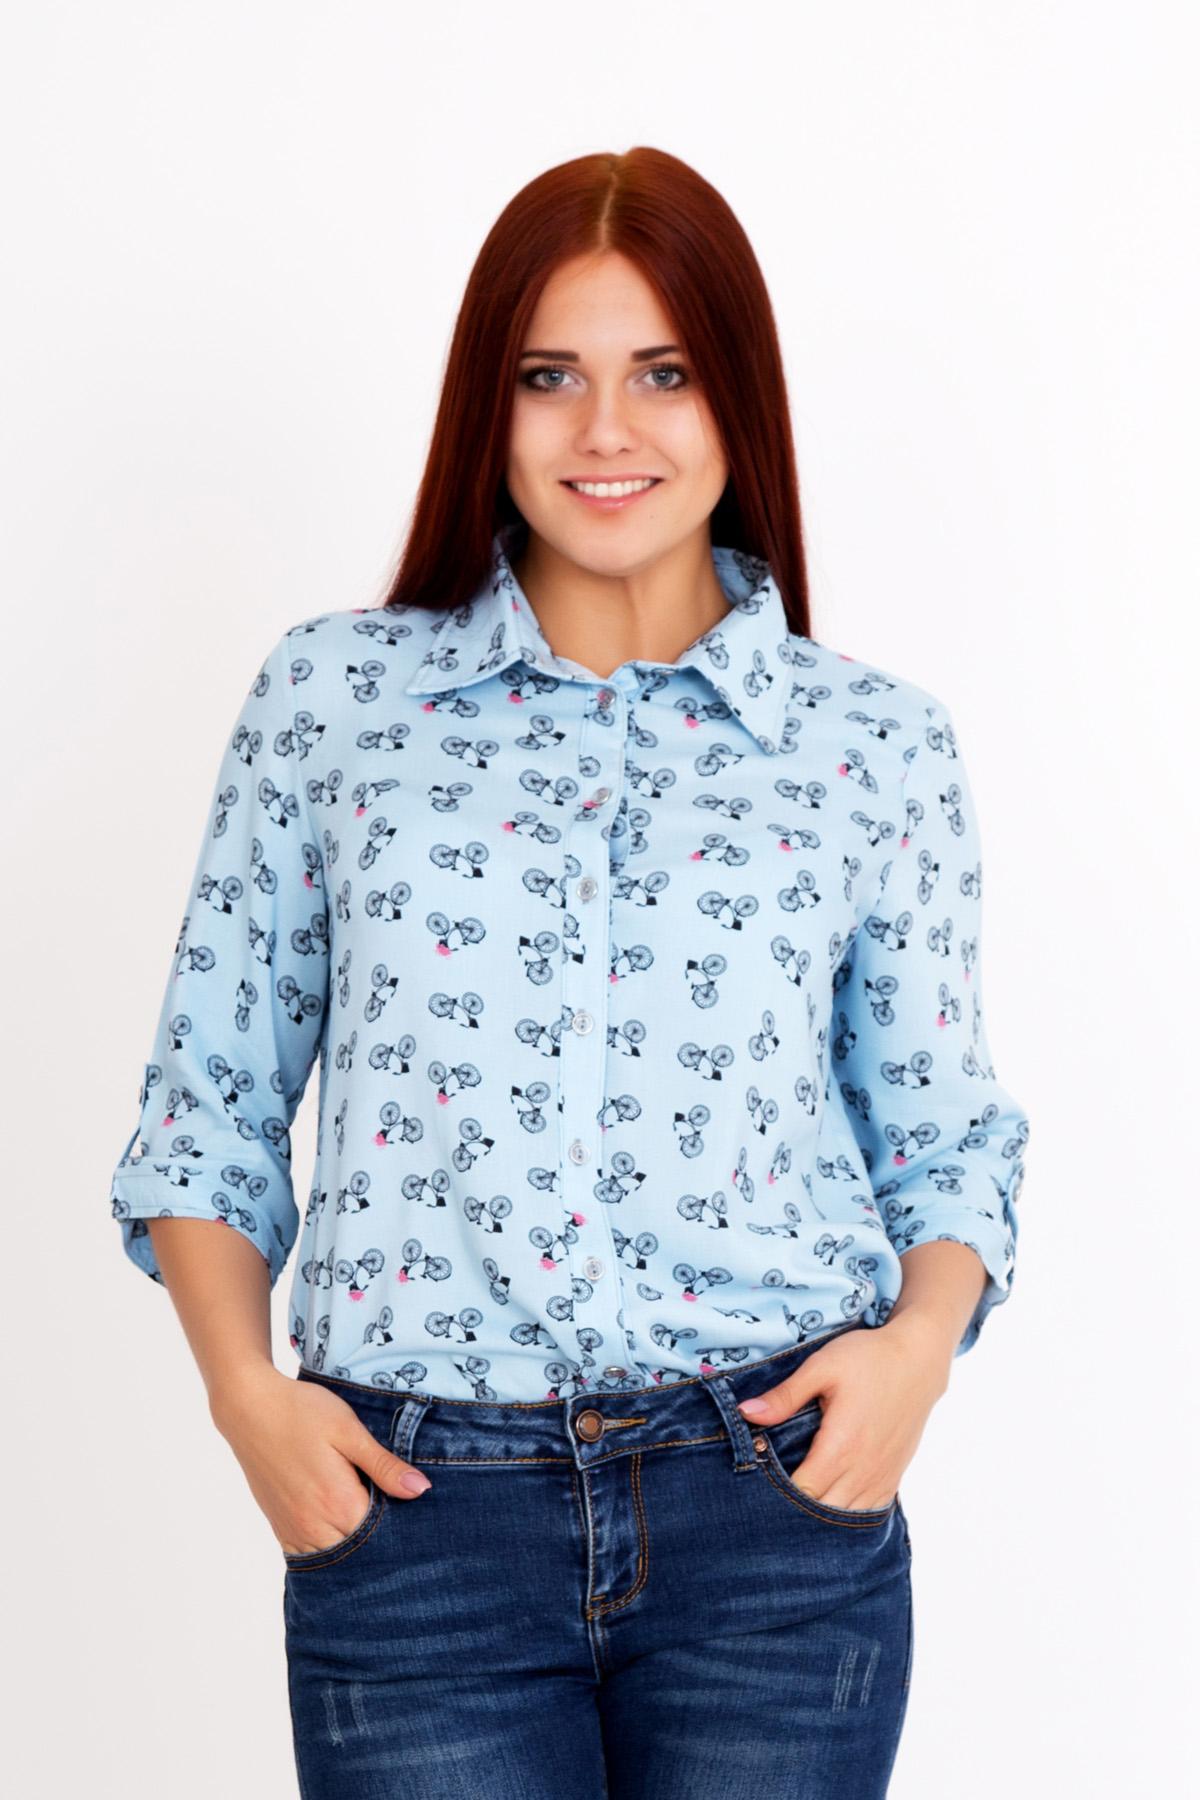 Жен. рубашка Виола р. 52Блузки, майки, кофты<br>Обхват груди:104 см<br>Обхват талии:85 см<br>Обхват бедер:112 см<br>Длина по спинке:69 см<br>Рост:167 см<br><br>Тип: Жен. рубашка<br>Размер: 52<br>Материал: Штапель